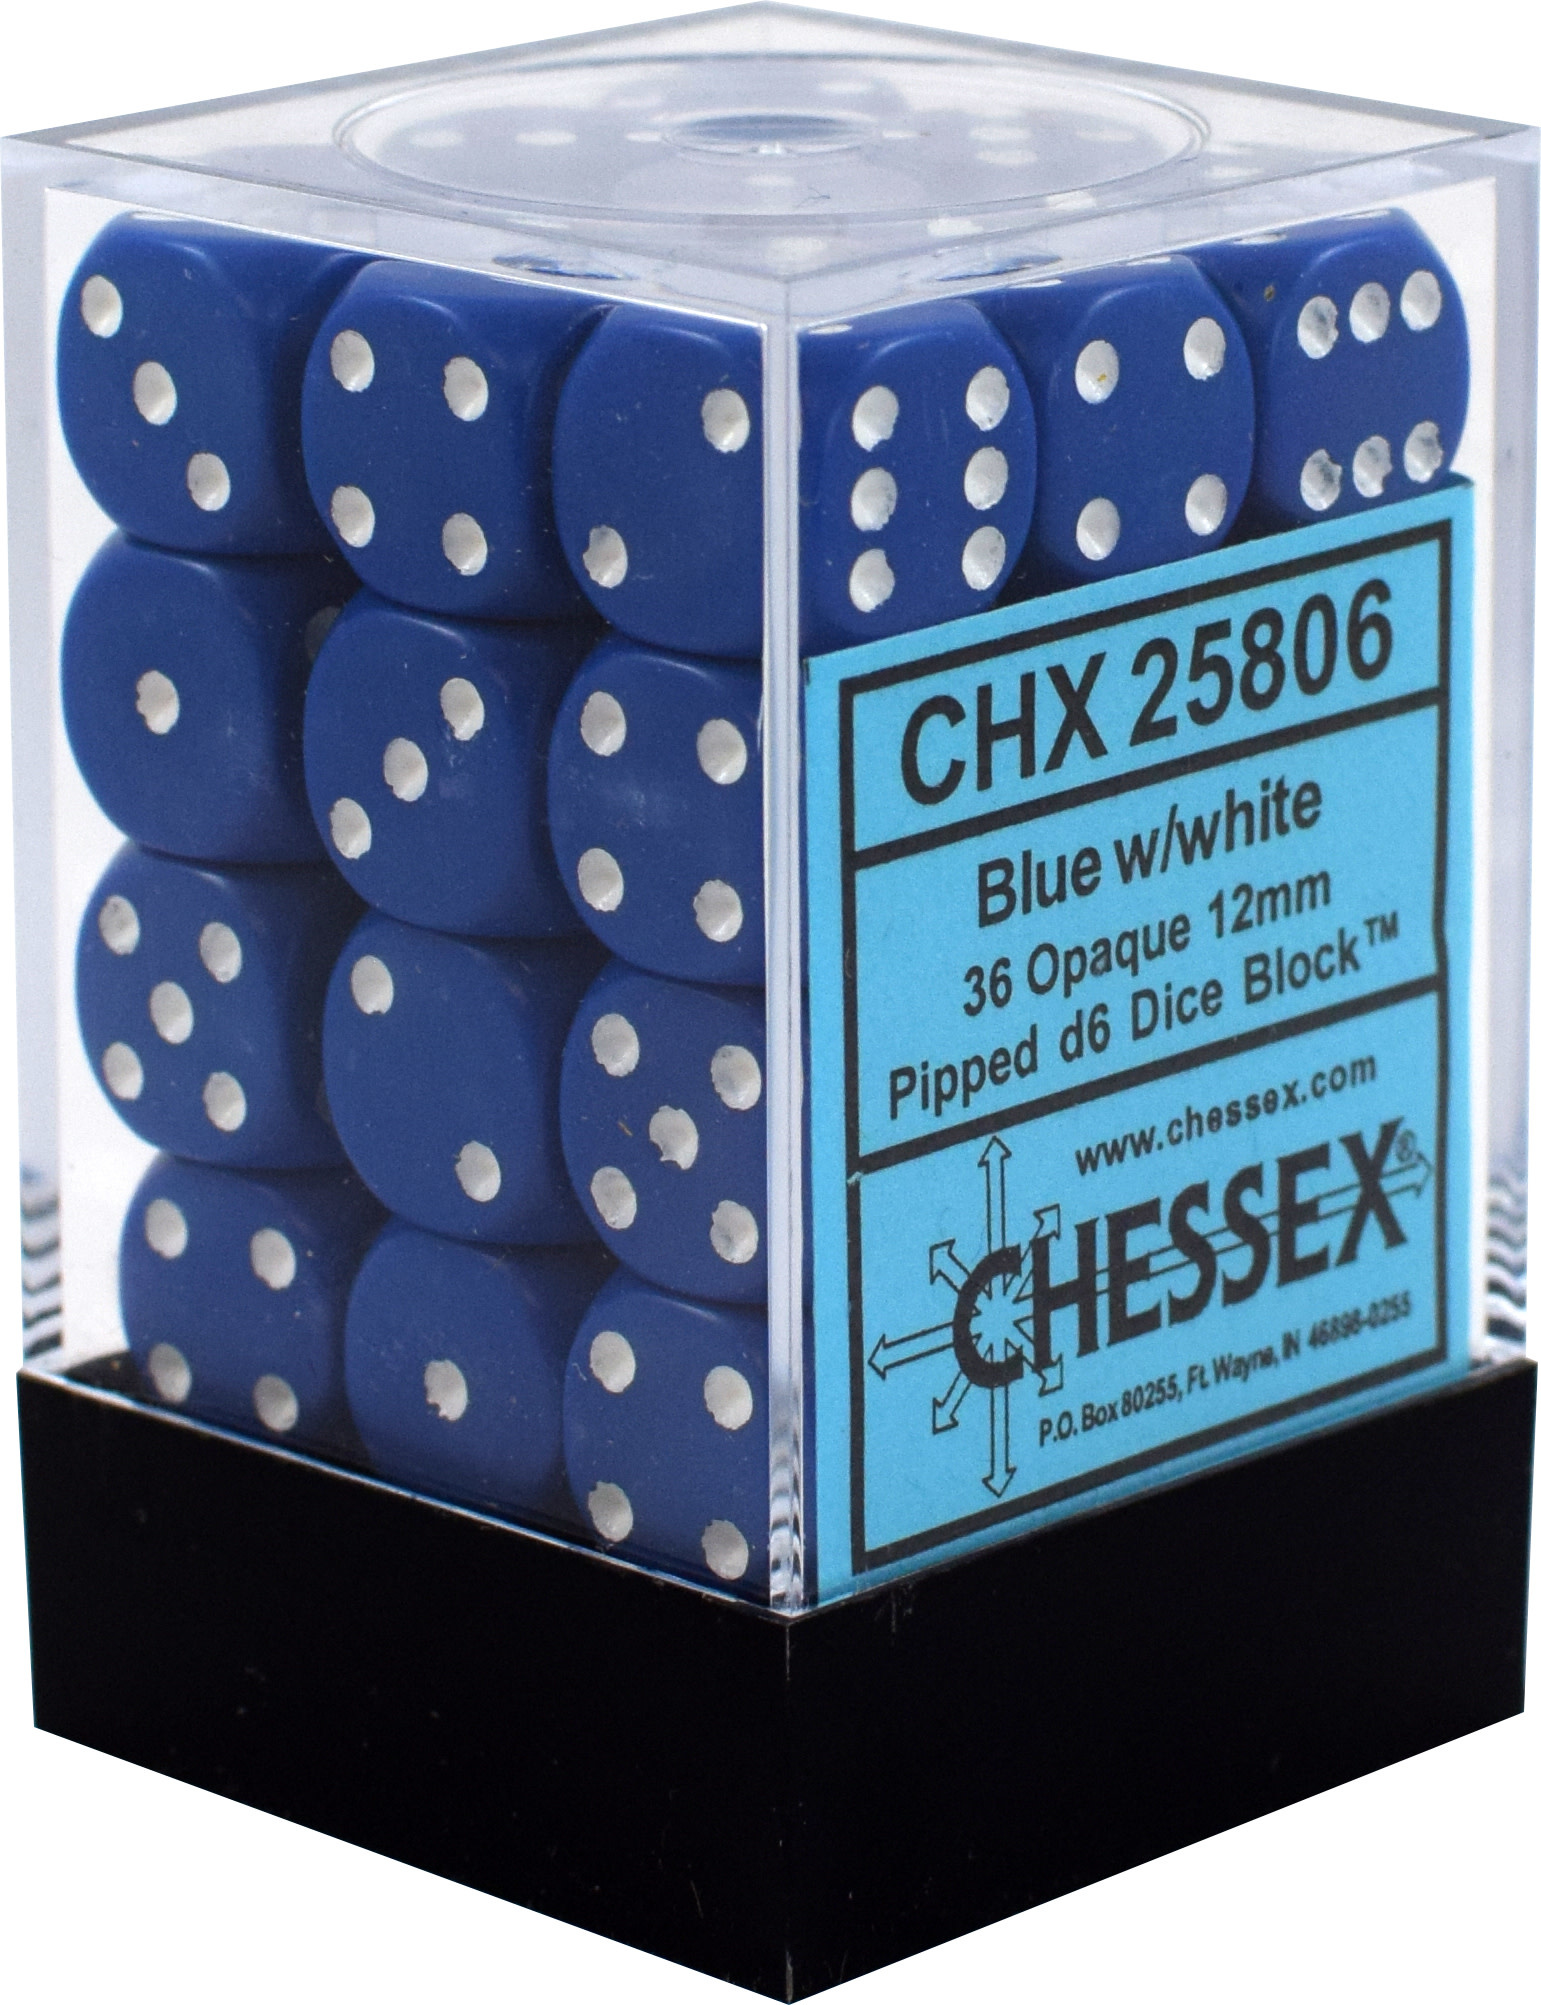 CHX25806 - OPAQUE 36D6 BLUE/WHITE 12MM